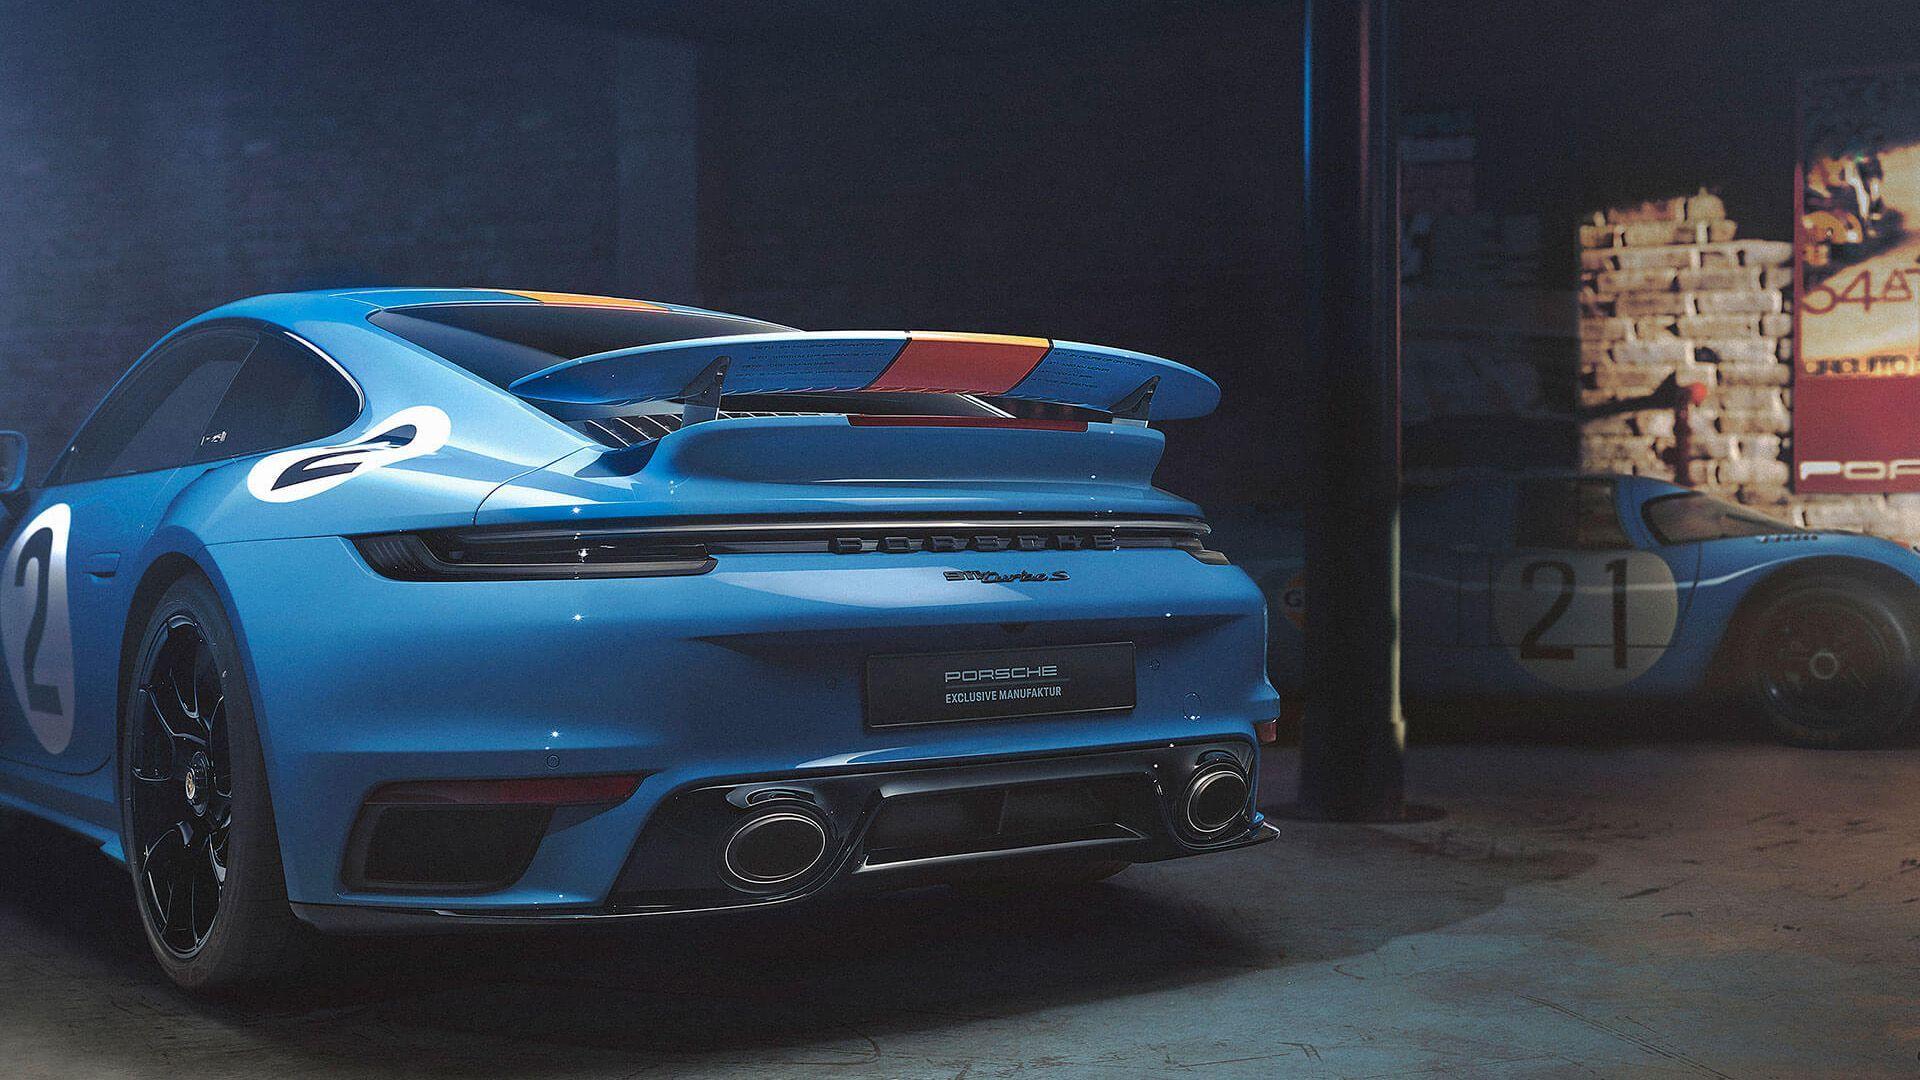 Porsche-911-Turbo-S-Pedro-Rodriguez-2